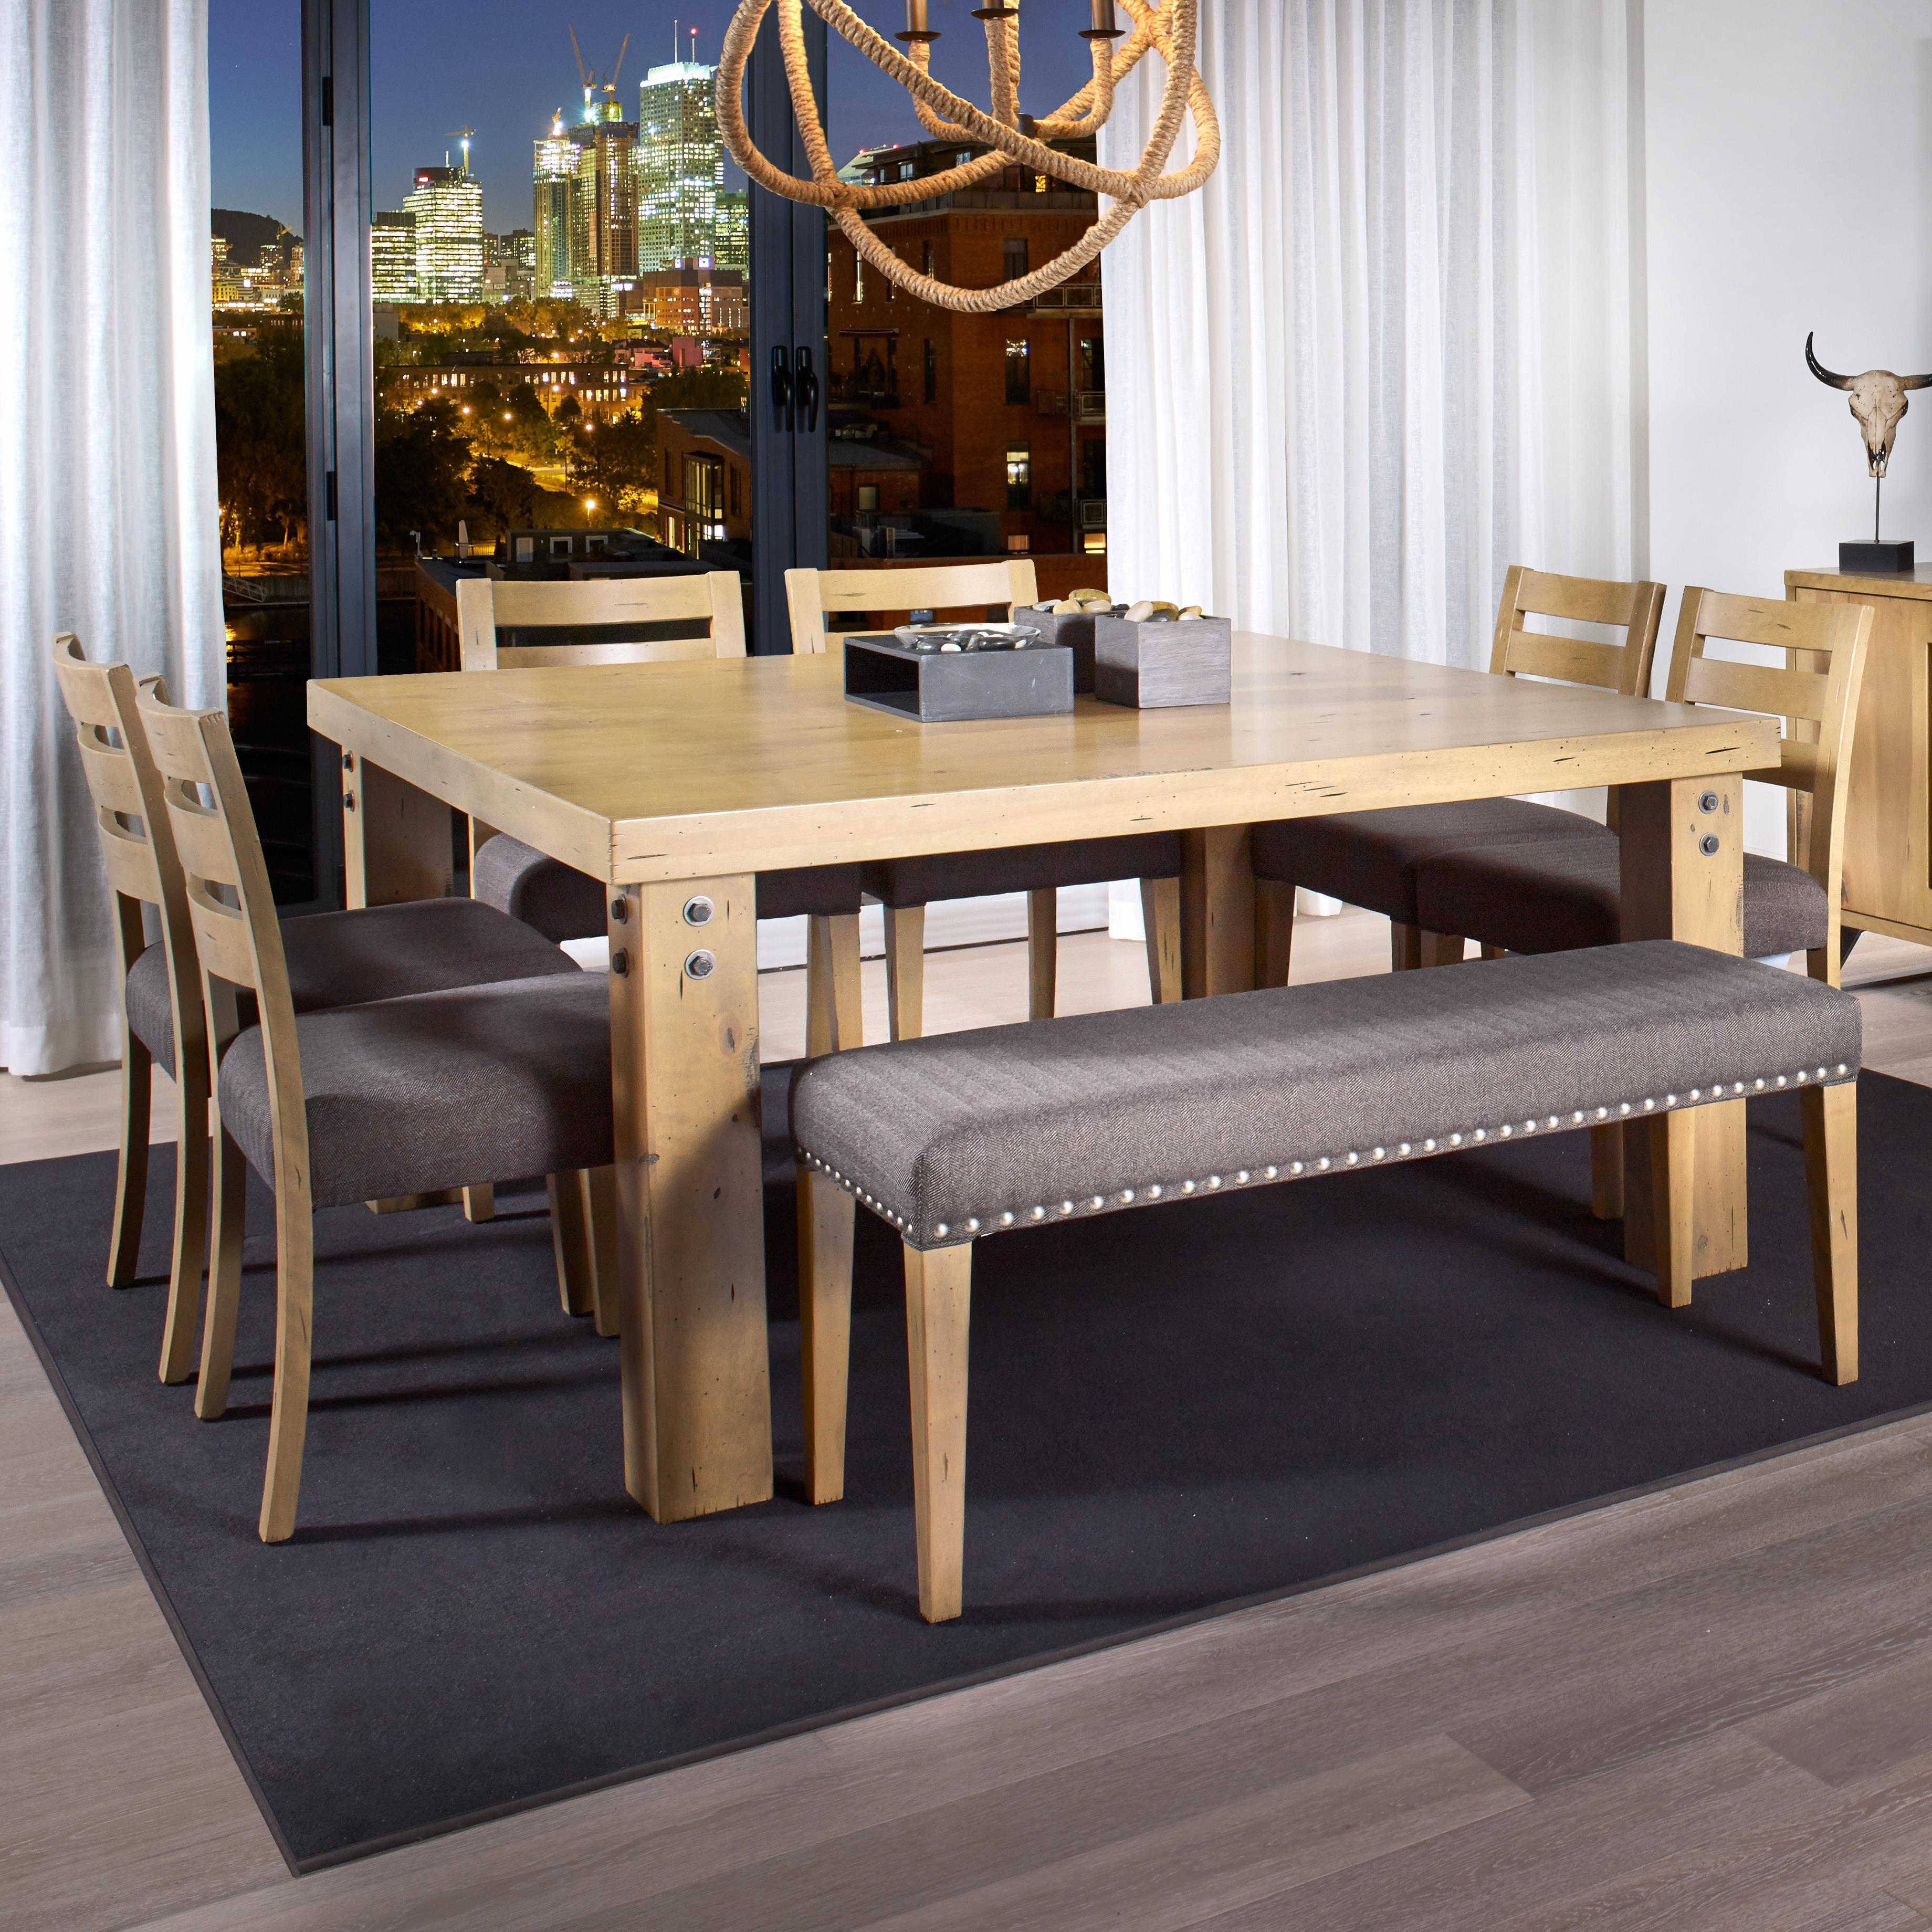 canadel loft custom dining customizable square dining table set with bench john v schultz. Black Bedroom Furniture Sets. Home Design Ideas